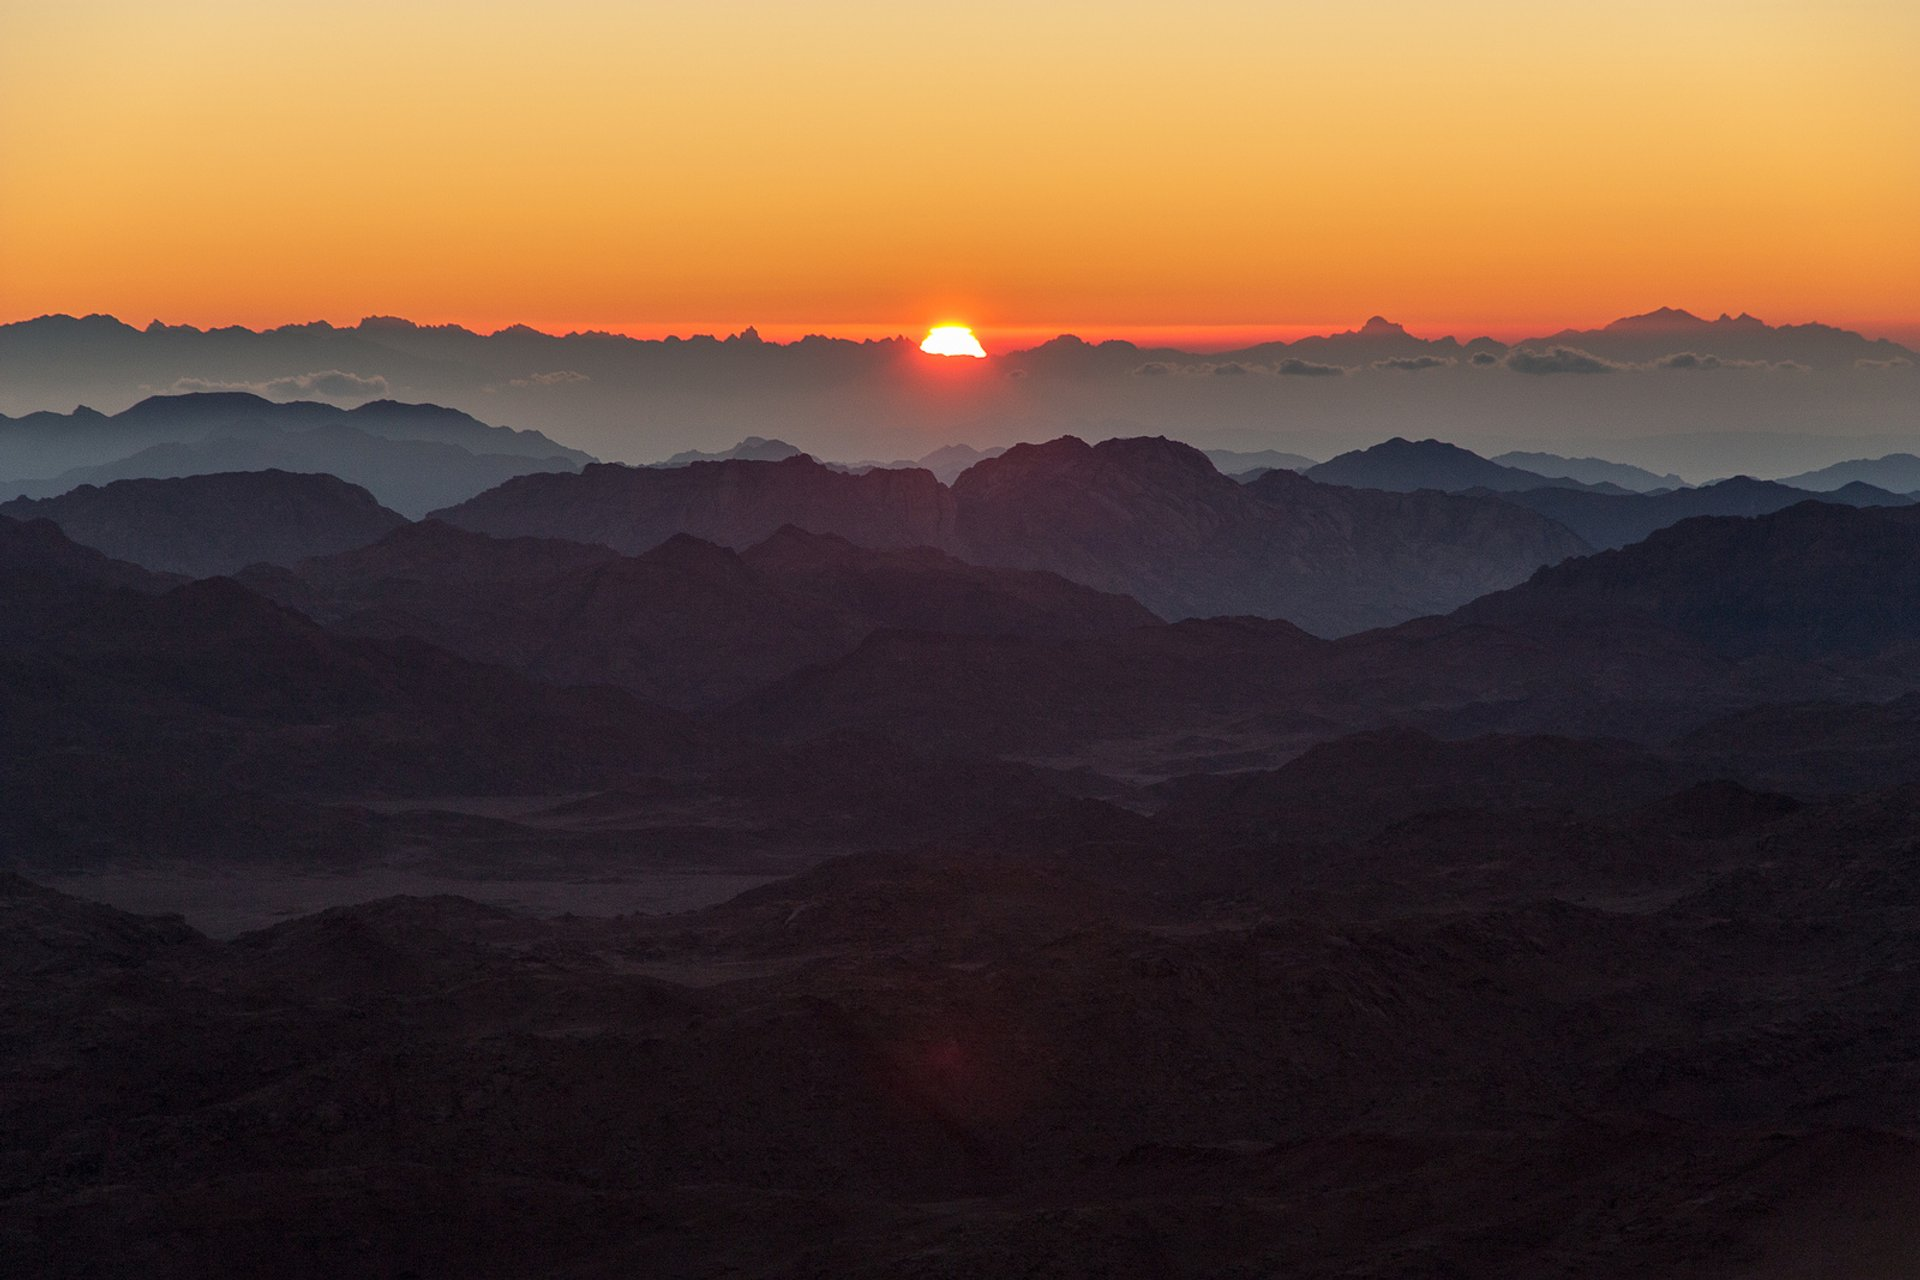 Sunrise or Sunset on Mount Sinai in Egypt 2020 - Best Time